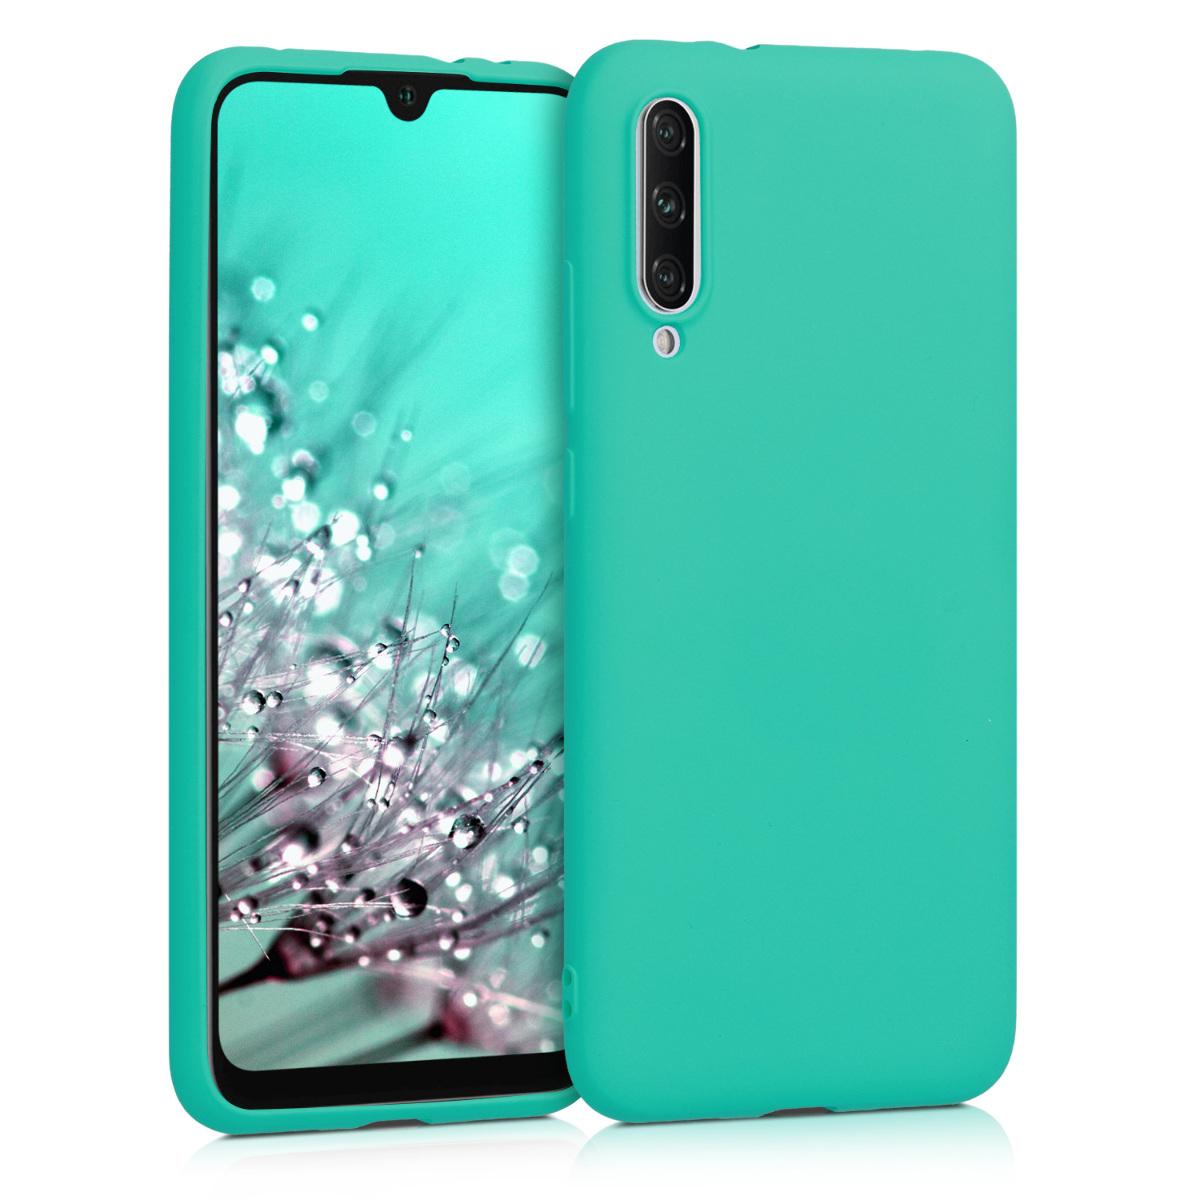 KW Θήκη Σιλικόνης Xiaomi Mi A3 - Neon Turquoise (49675.126)